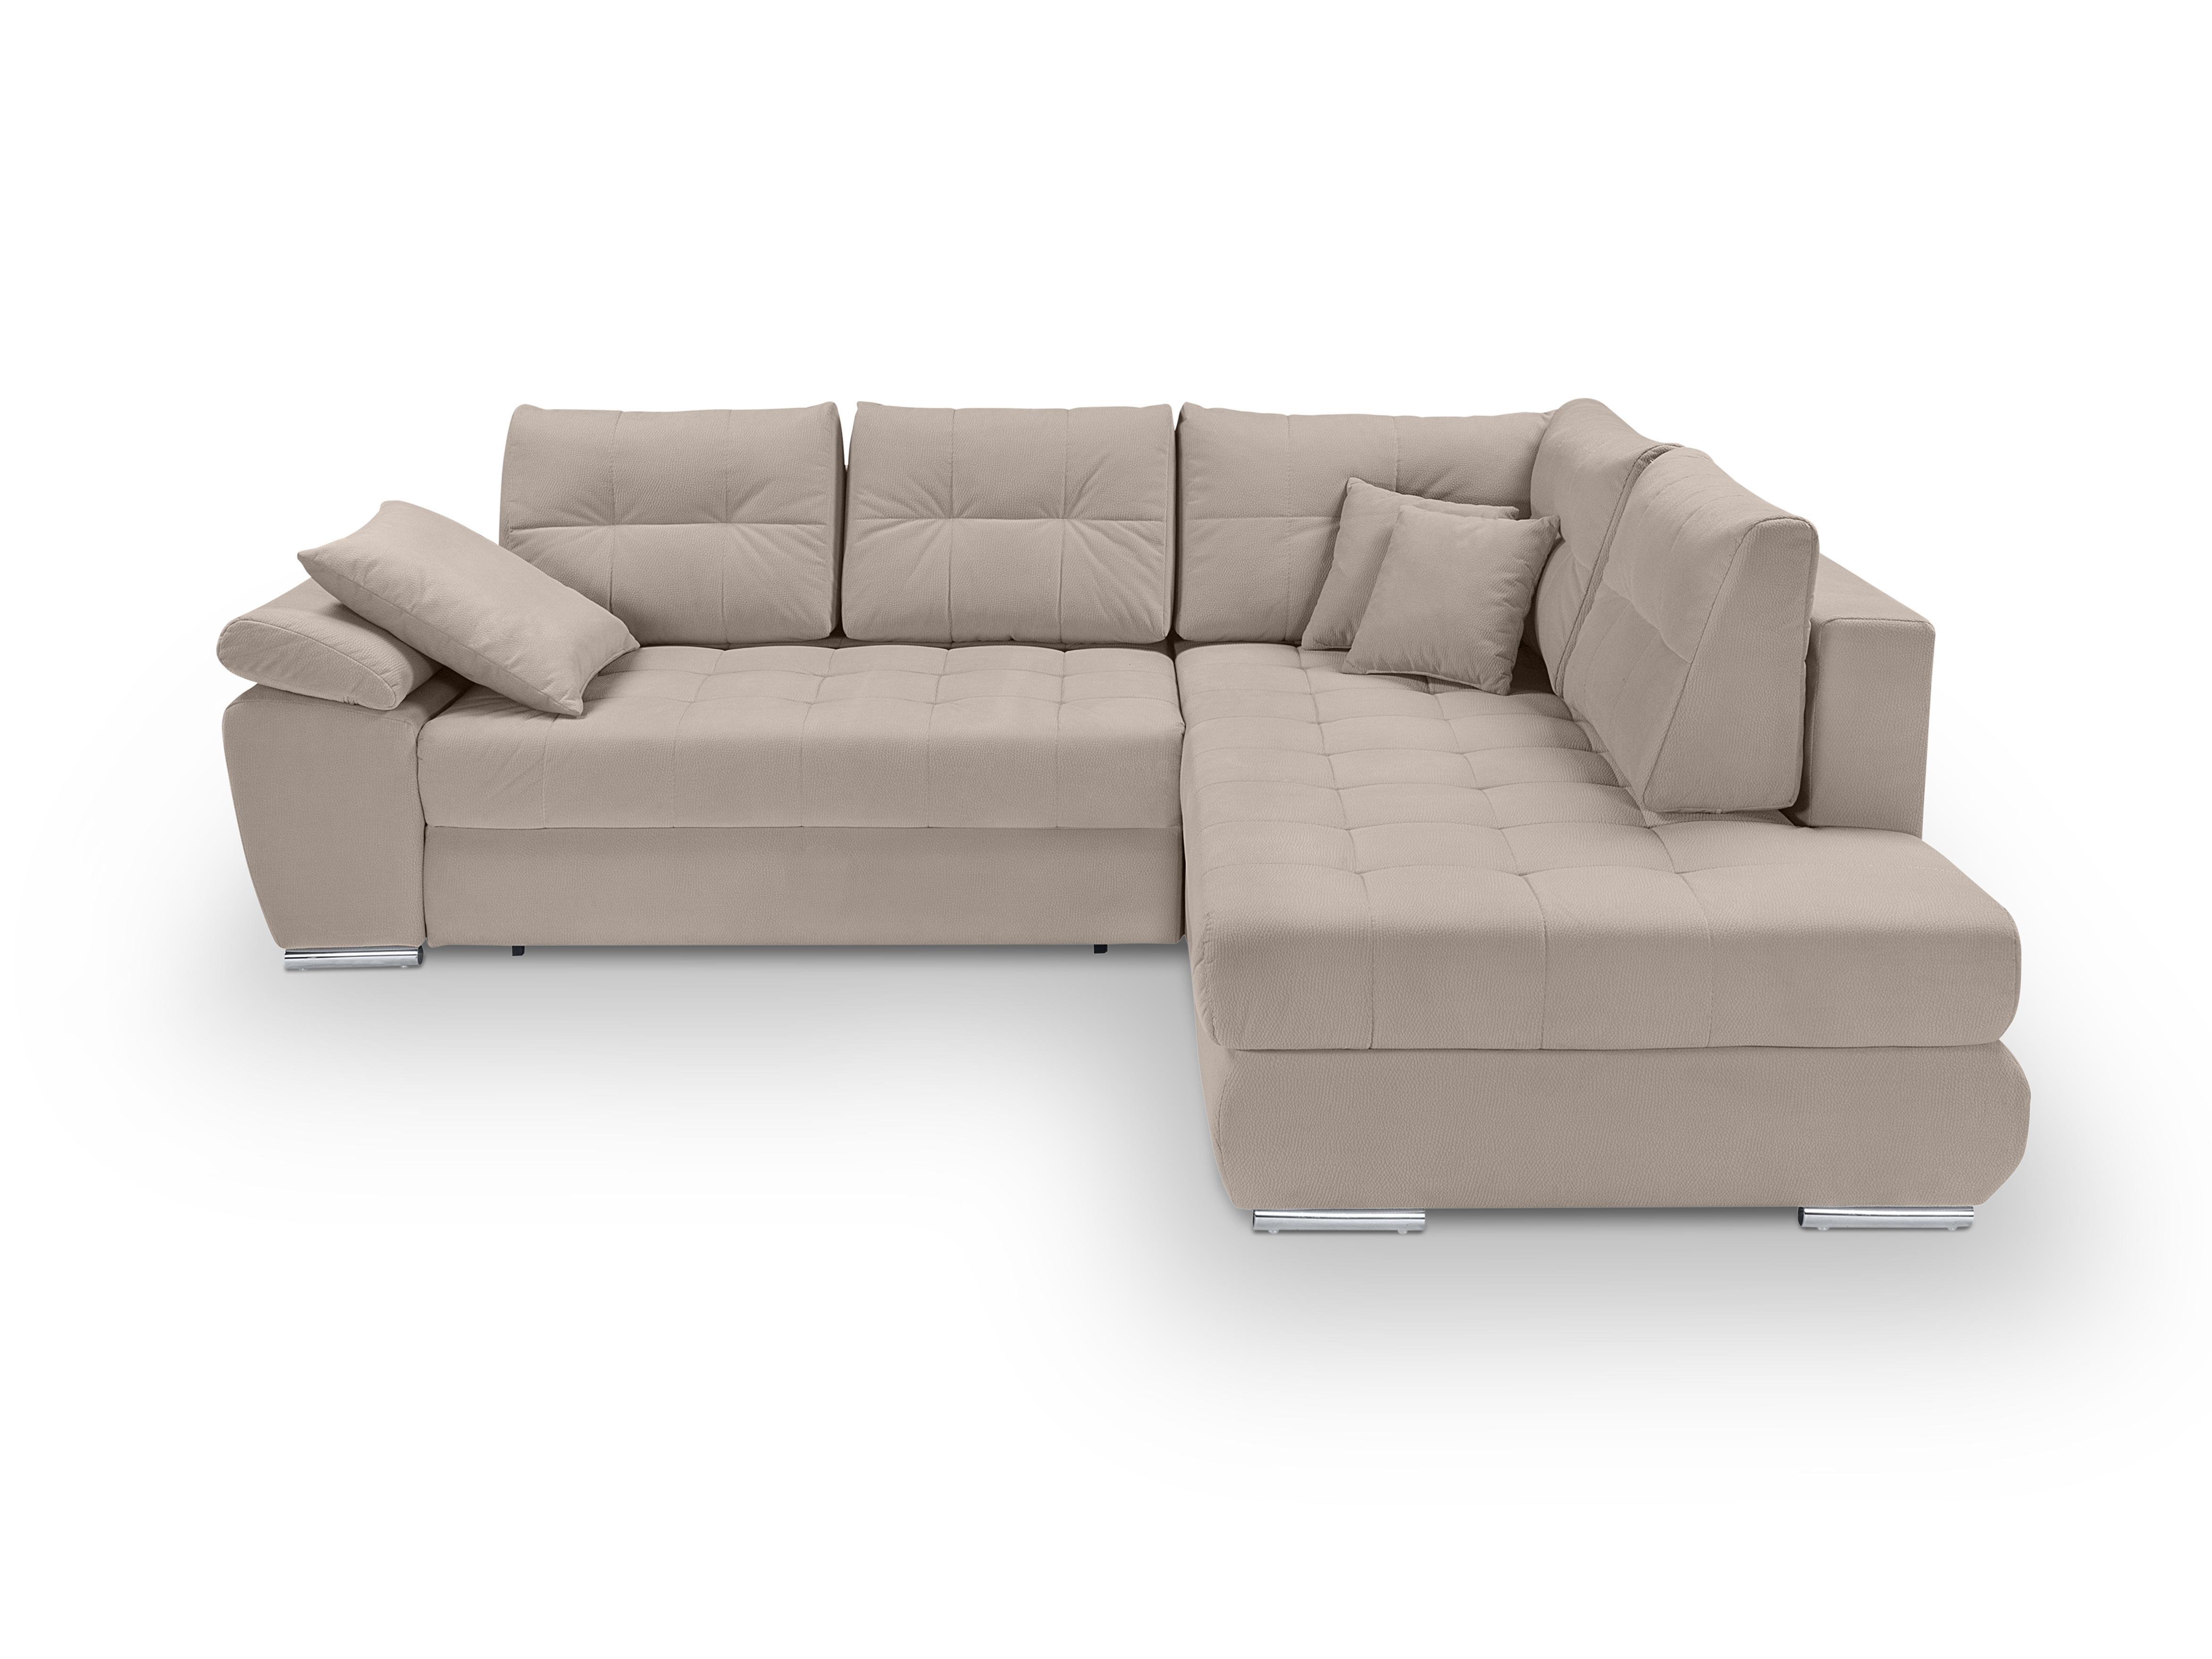 Rohová sedací souprava - BRW - Carl Lux 3DL.RECBK (béžová) (P)